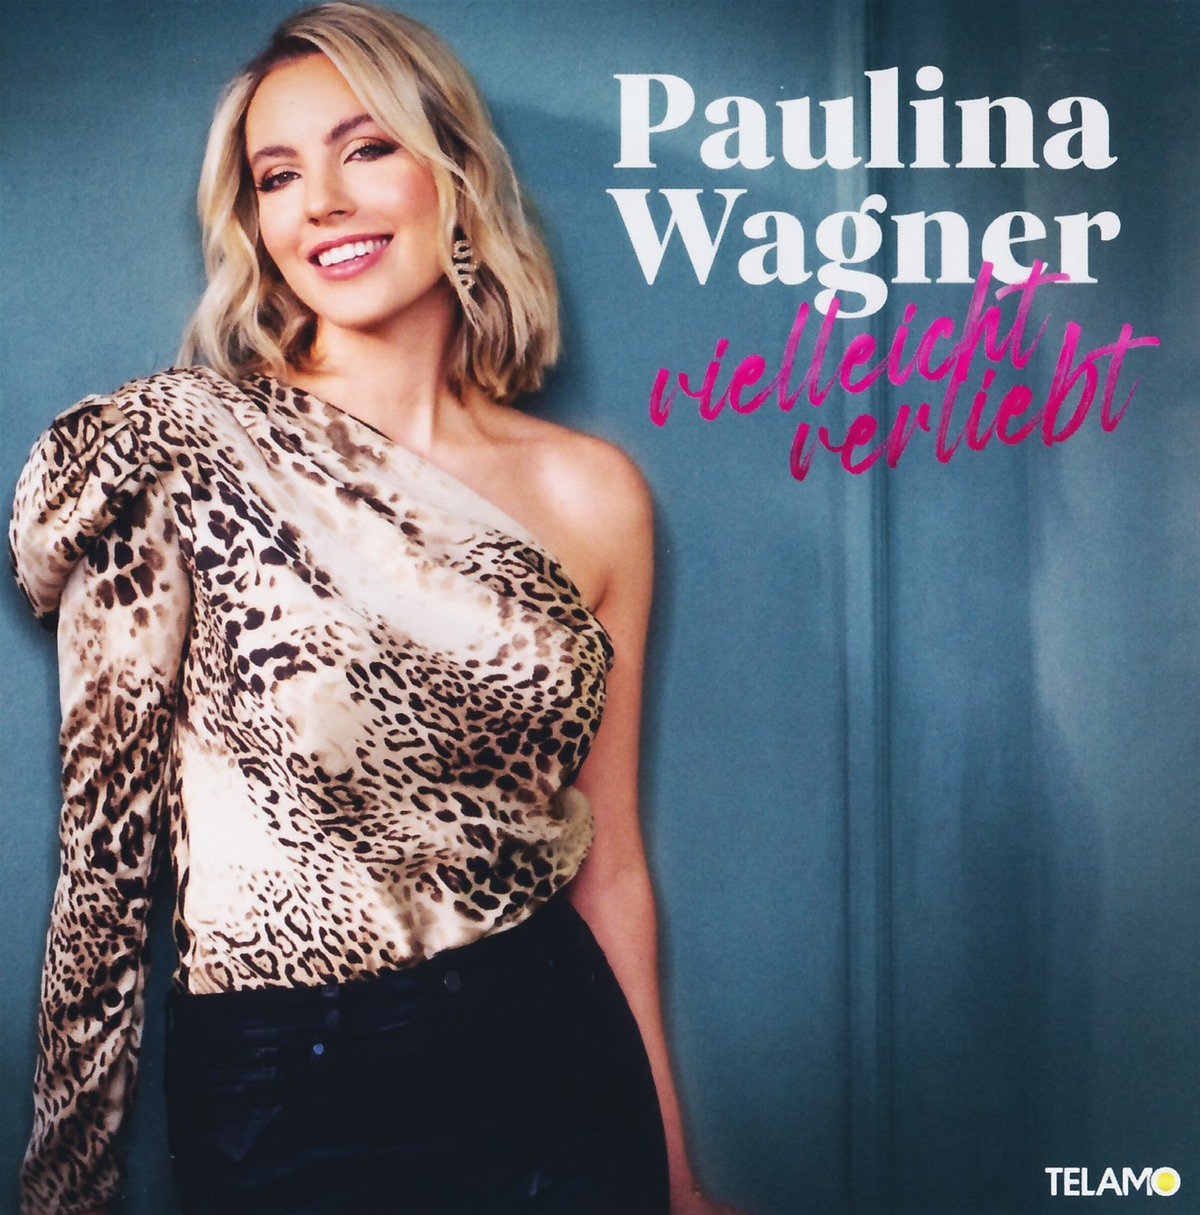 PAULINA WAGNER * Vielleicht verliebt (CD)